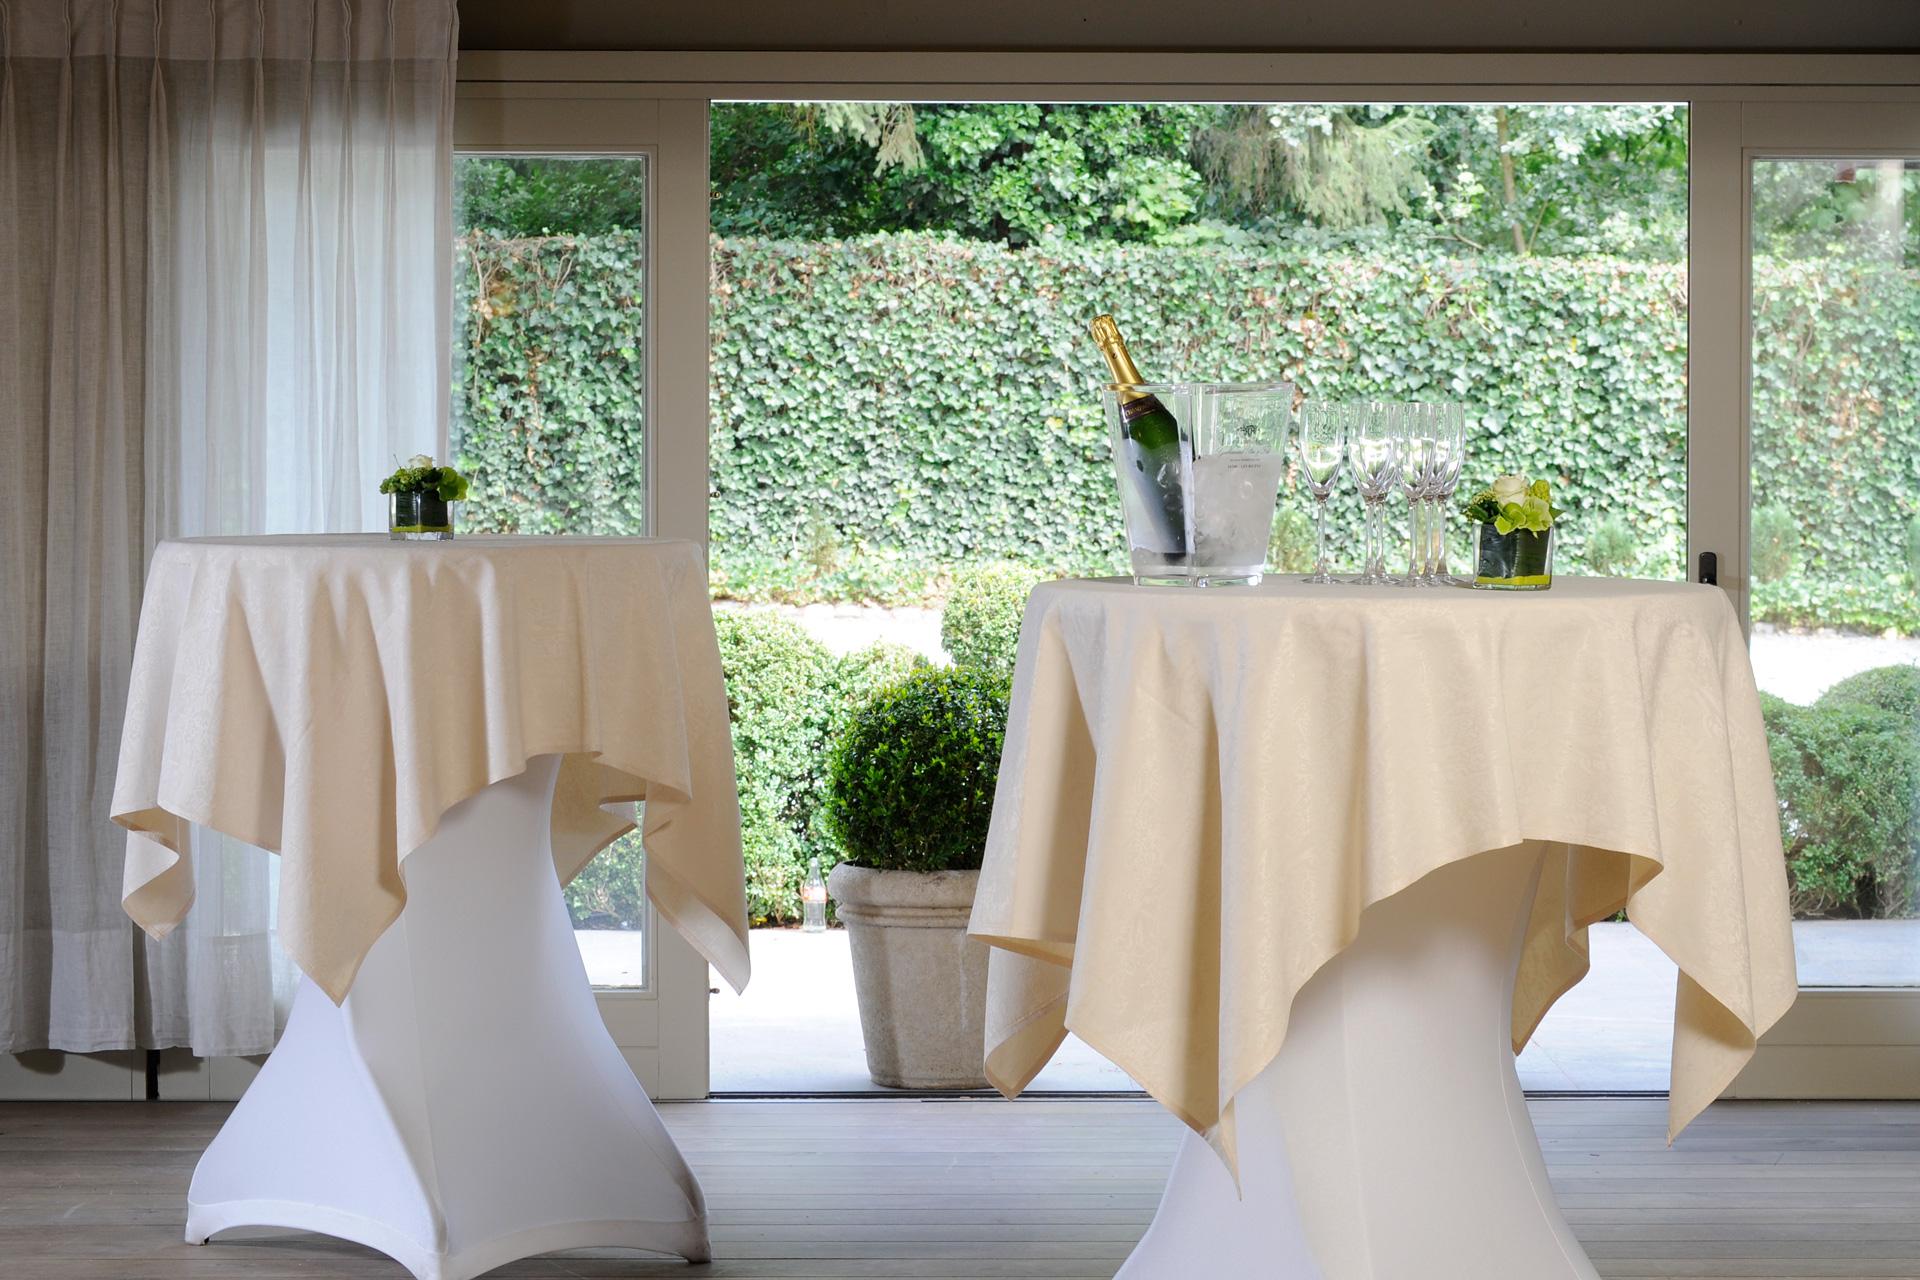 restaurant-malpertus-in-st-niklaas_DSC4302